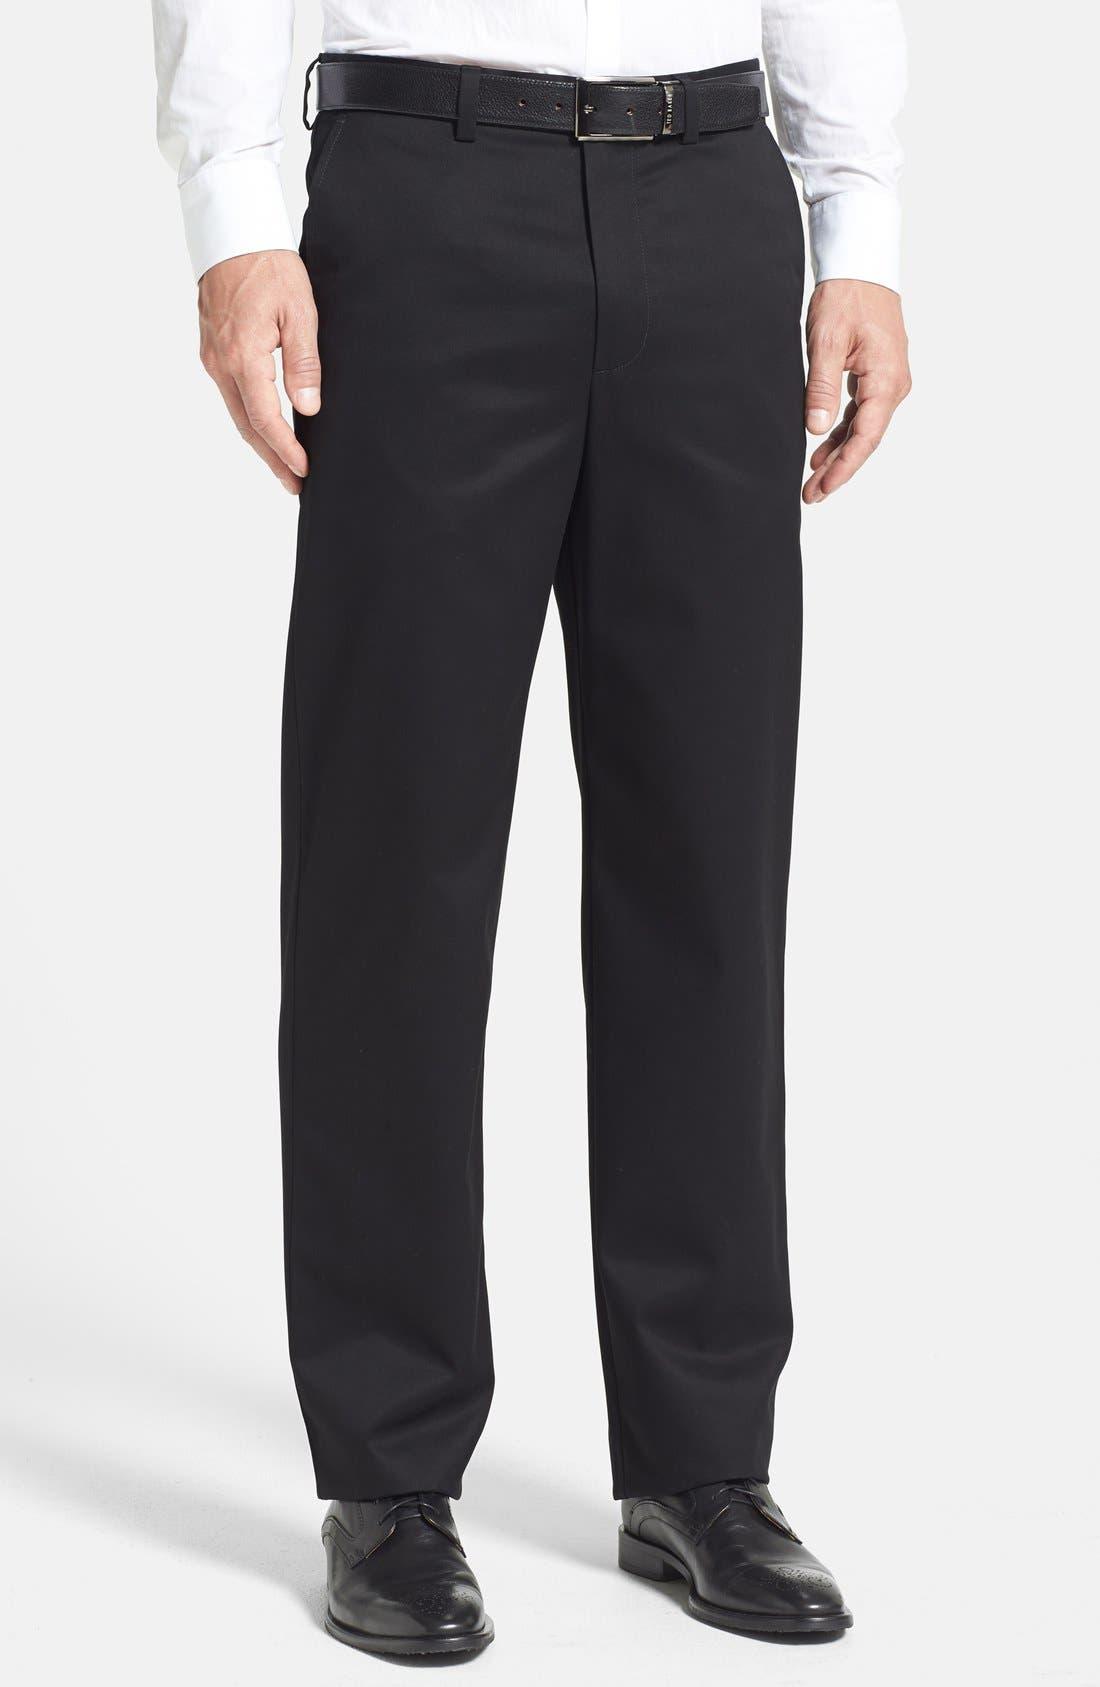 Image of NORDSTROM MEN'S SHOP 'Classic' Smartcare(TM) Relaxed Fit Flat Front Cotton Pants